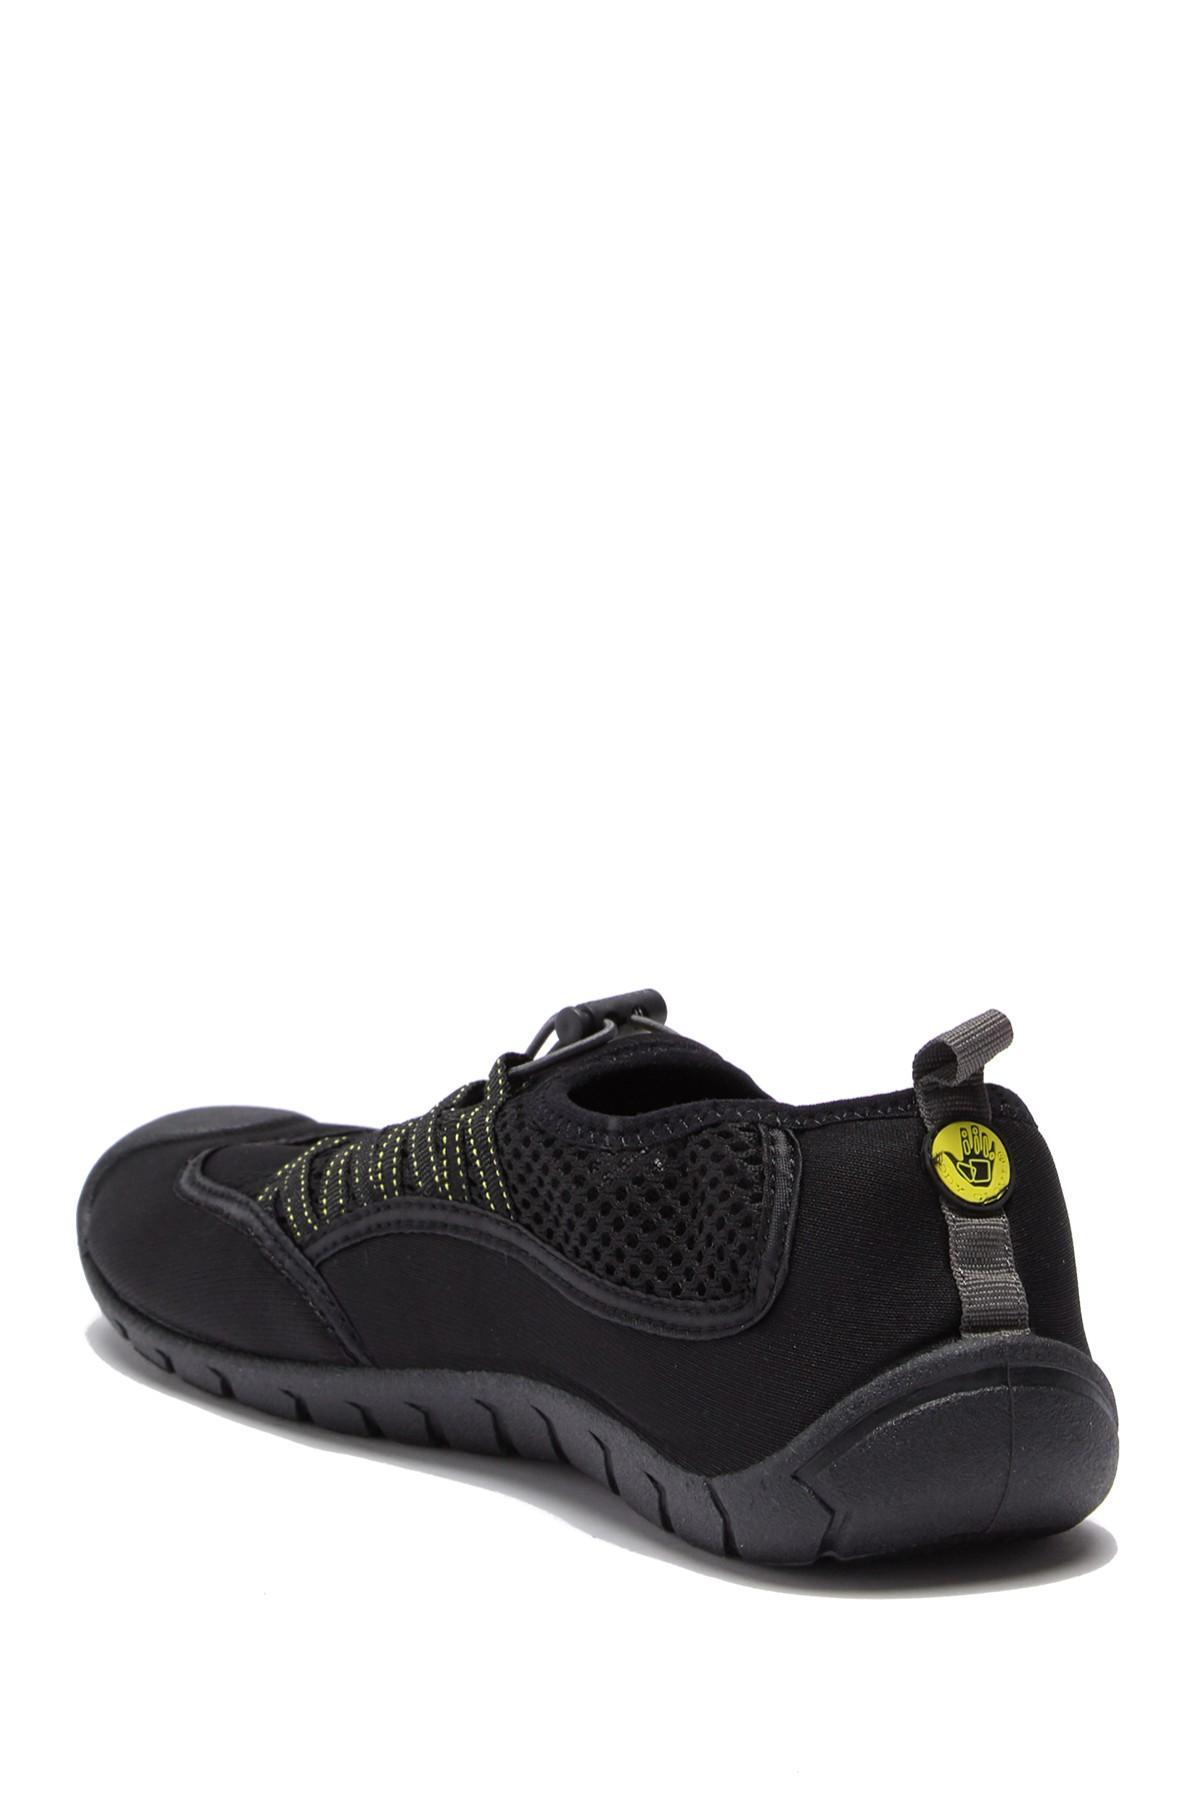 BODY GLOVE Sidewinder Water Shoes Mens Black//Yellow Lightweight Mesh Size 8 new